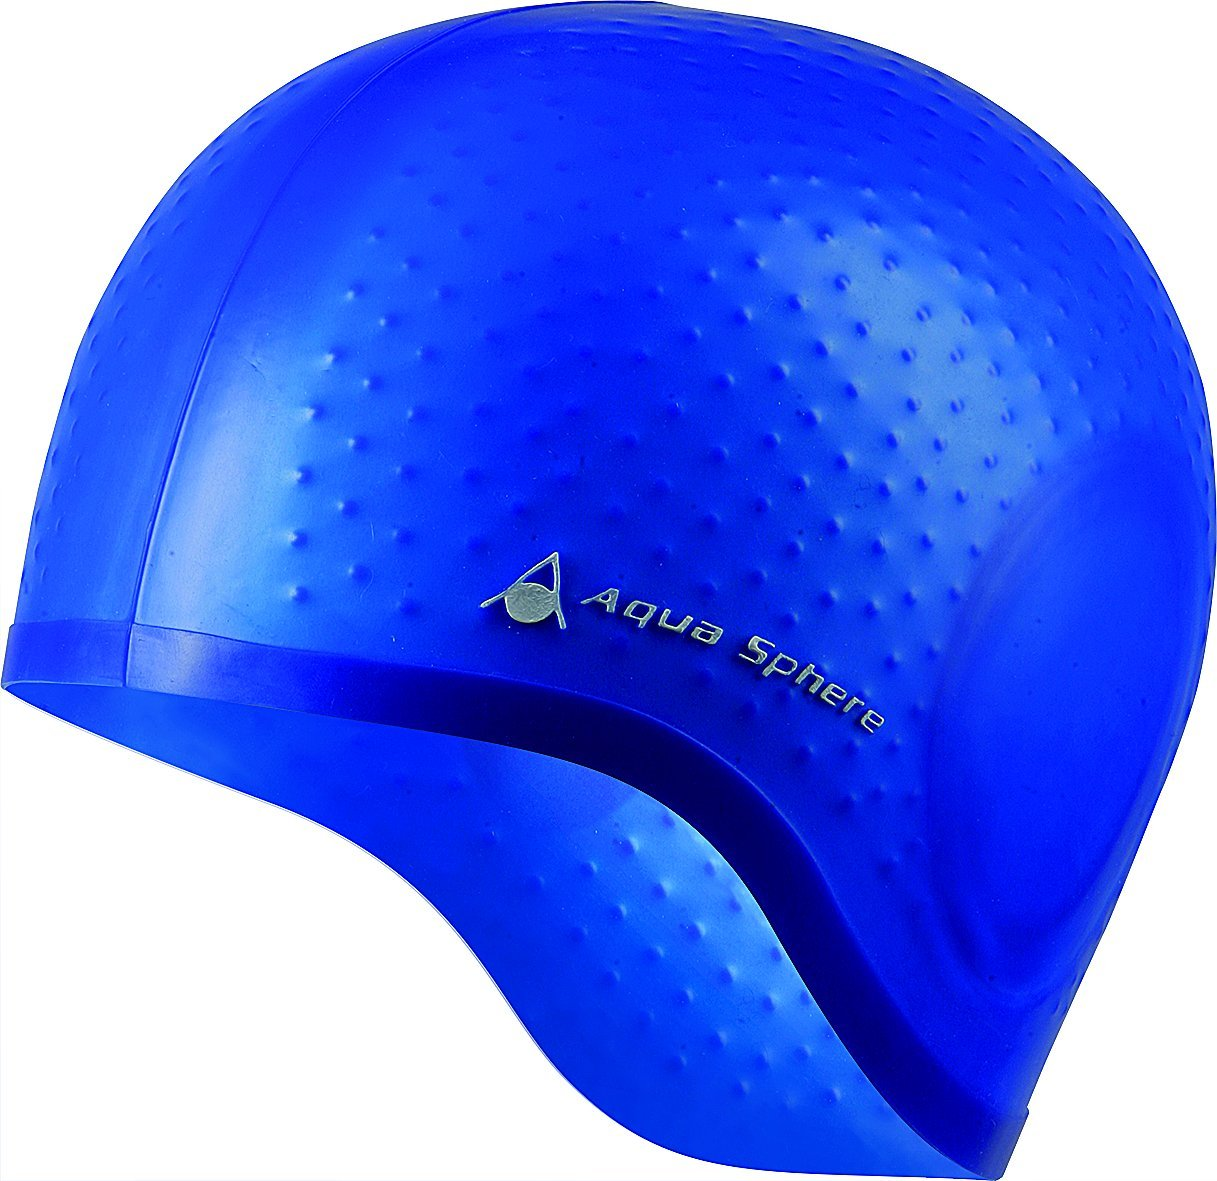 Aqua Sphere 2pk Tricap Adult Silicone Wrinkle Free 100/% UV Protection Swim Cap